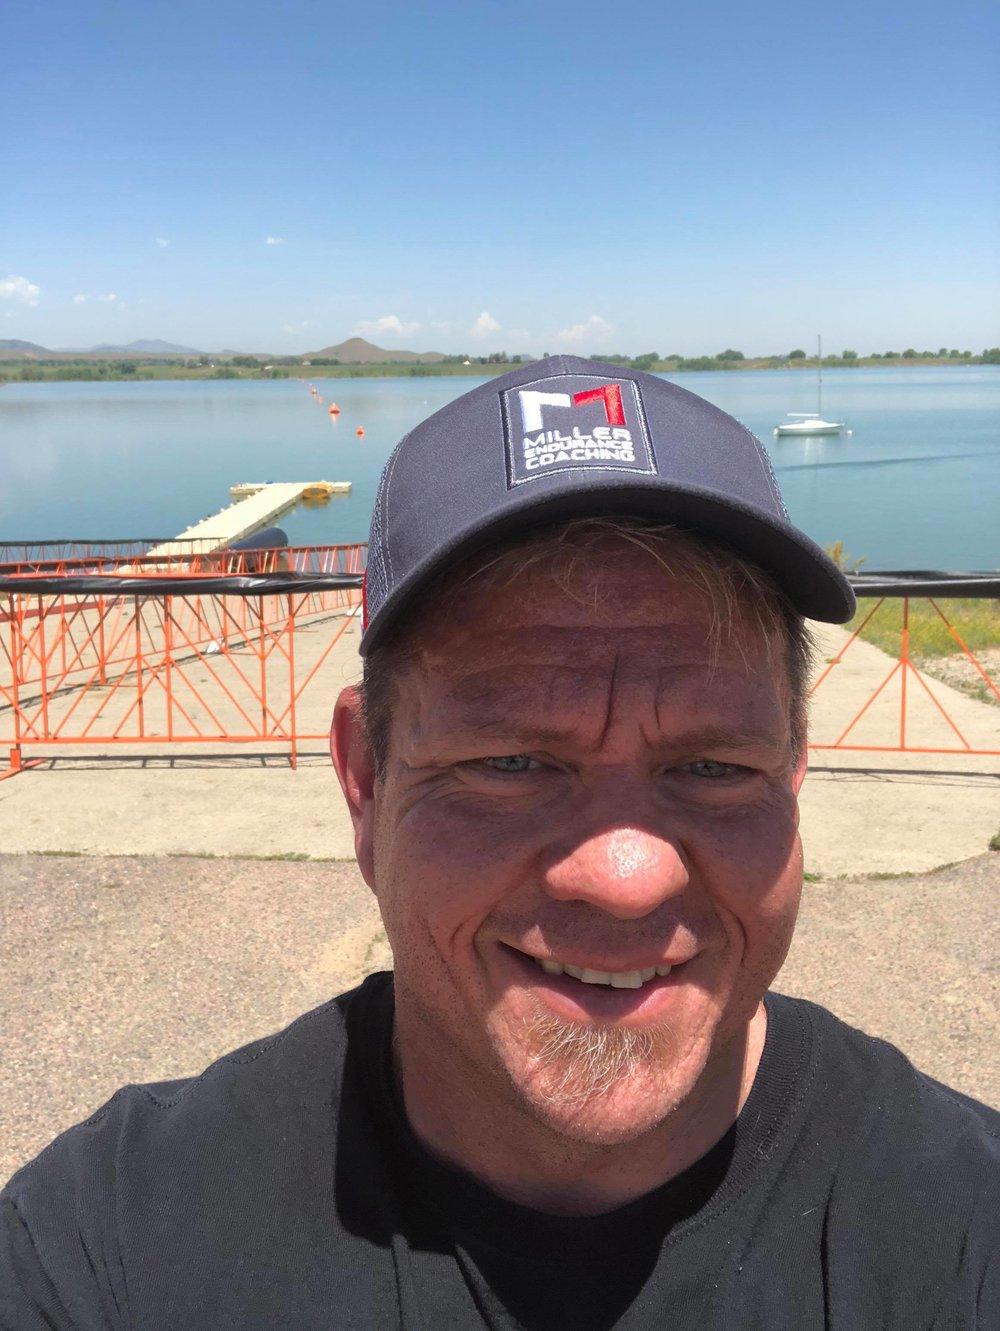 Coach_Terry_Wilson_Pursuit_of_The_Perfect_Race_IRONMAN_Boulder_2018_Jarrett_Wyatt_At_The_Race.jpg